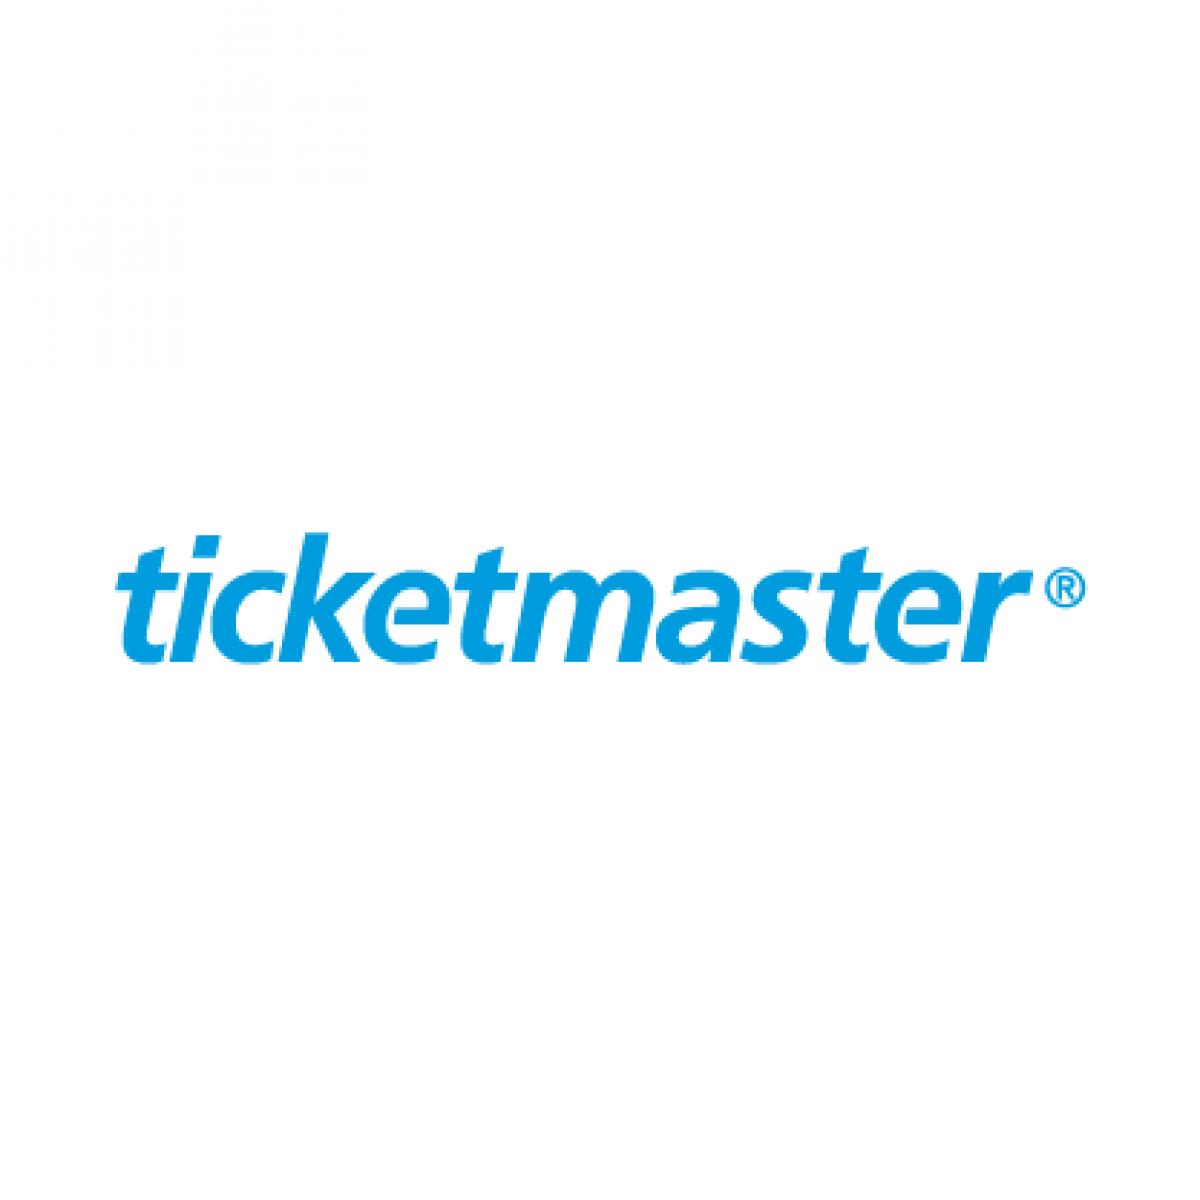 ticketmaster promo code